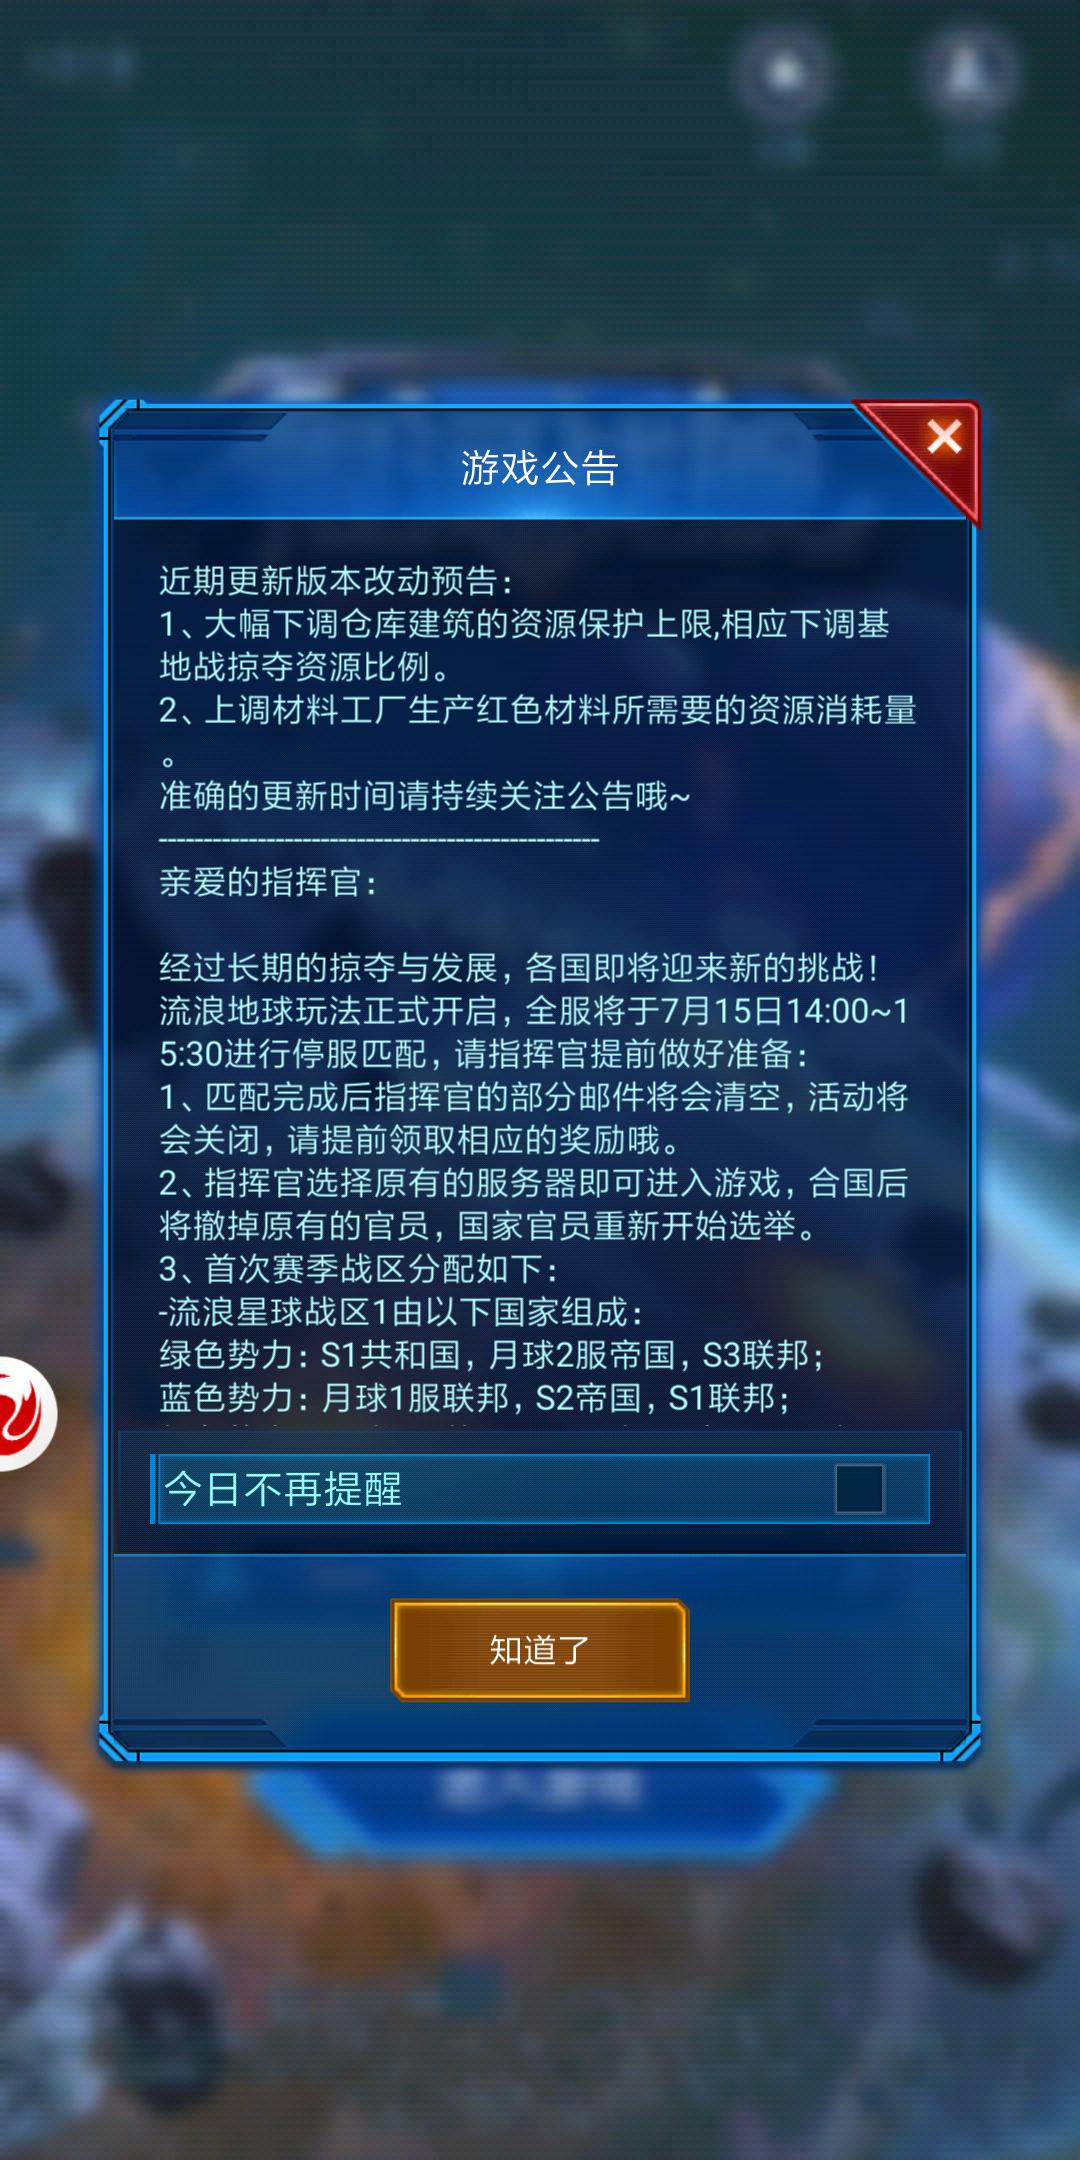 Screenshot_2019-07-16-17-48-01-693_com.yhzj.jedi.yueqiu.png